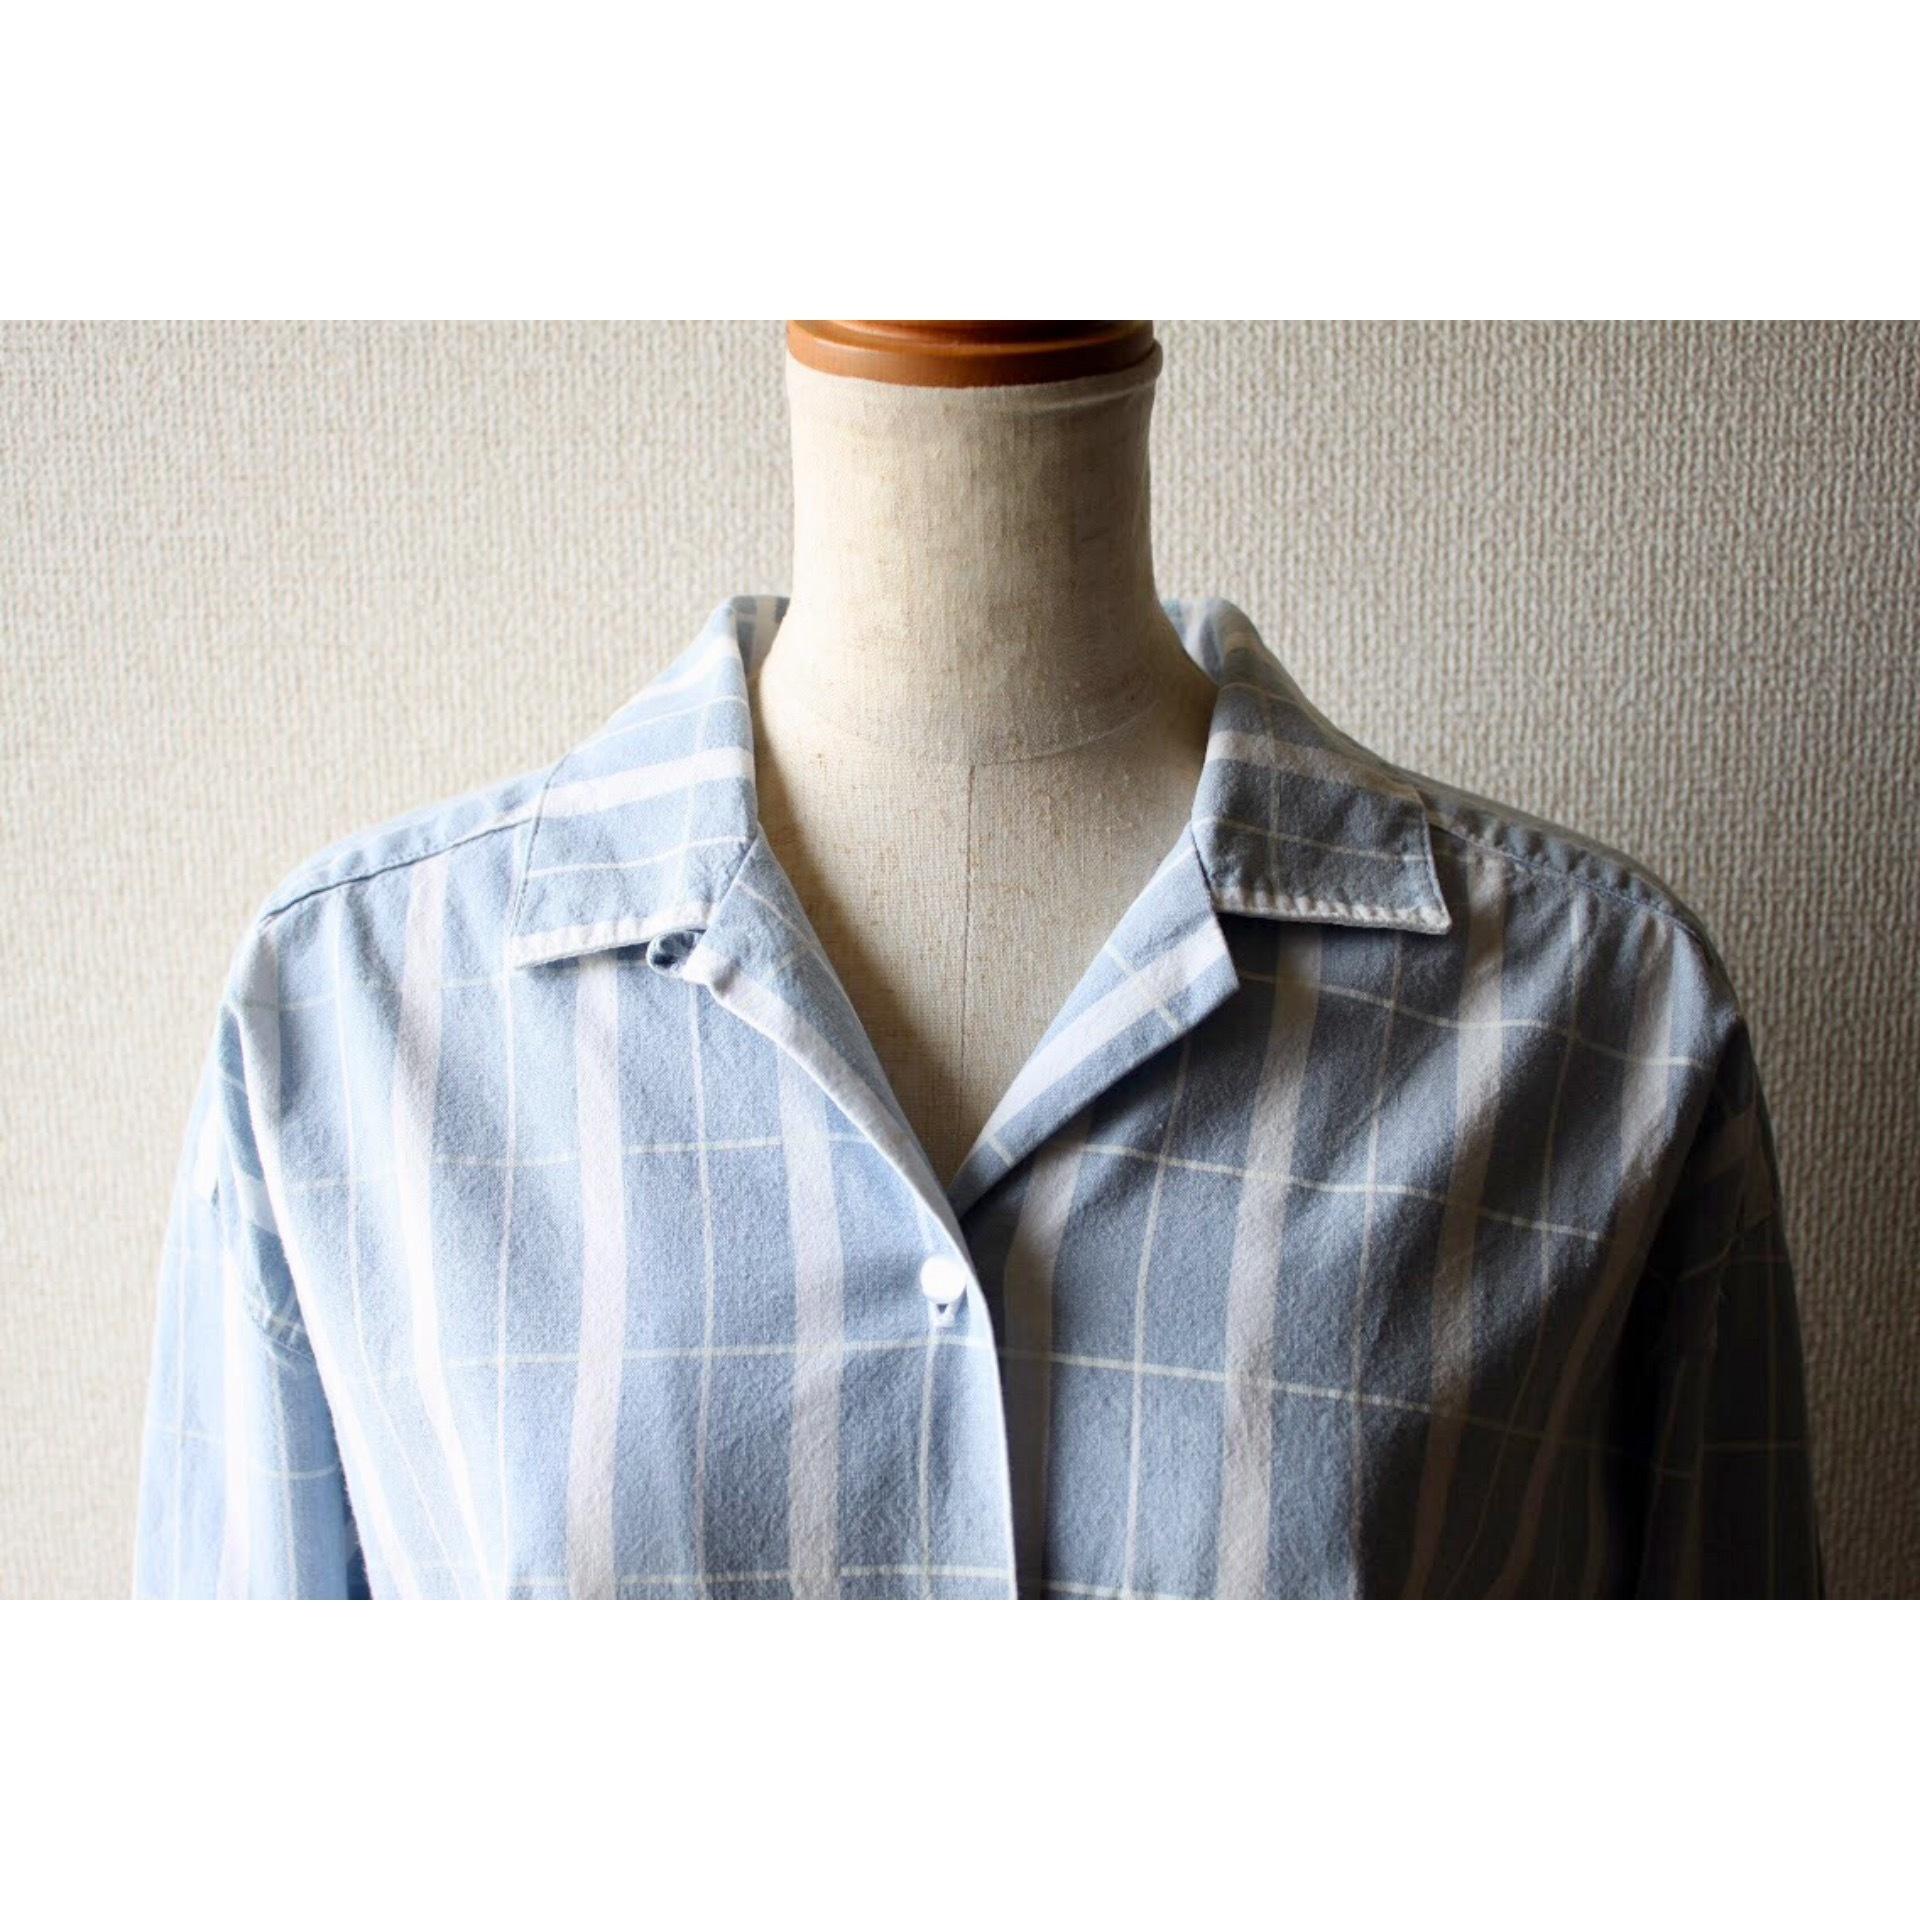 Vintage sax blue check shirt